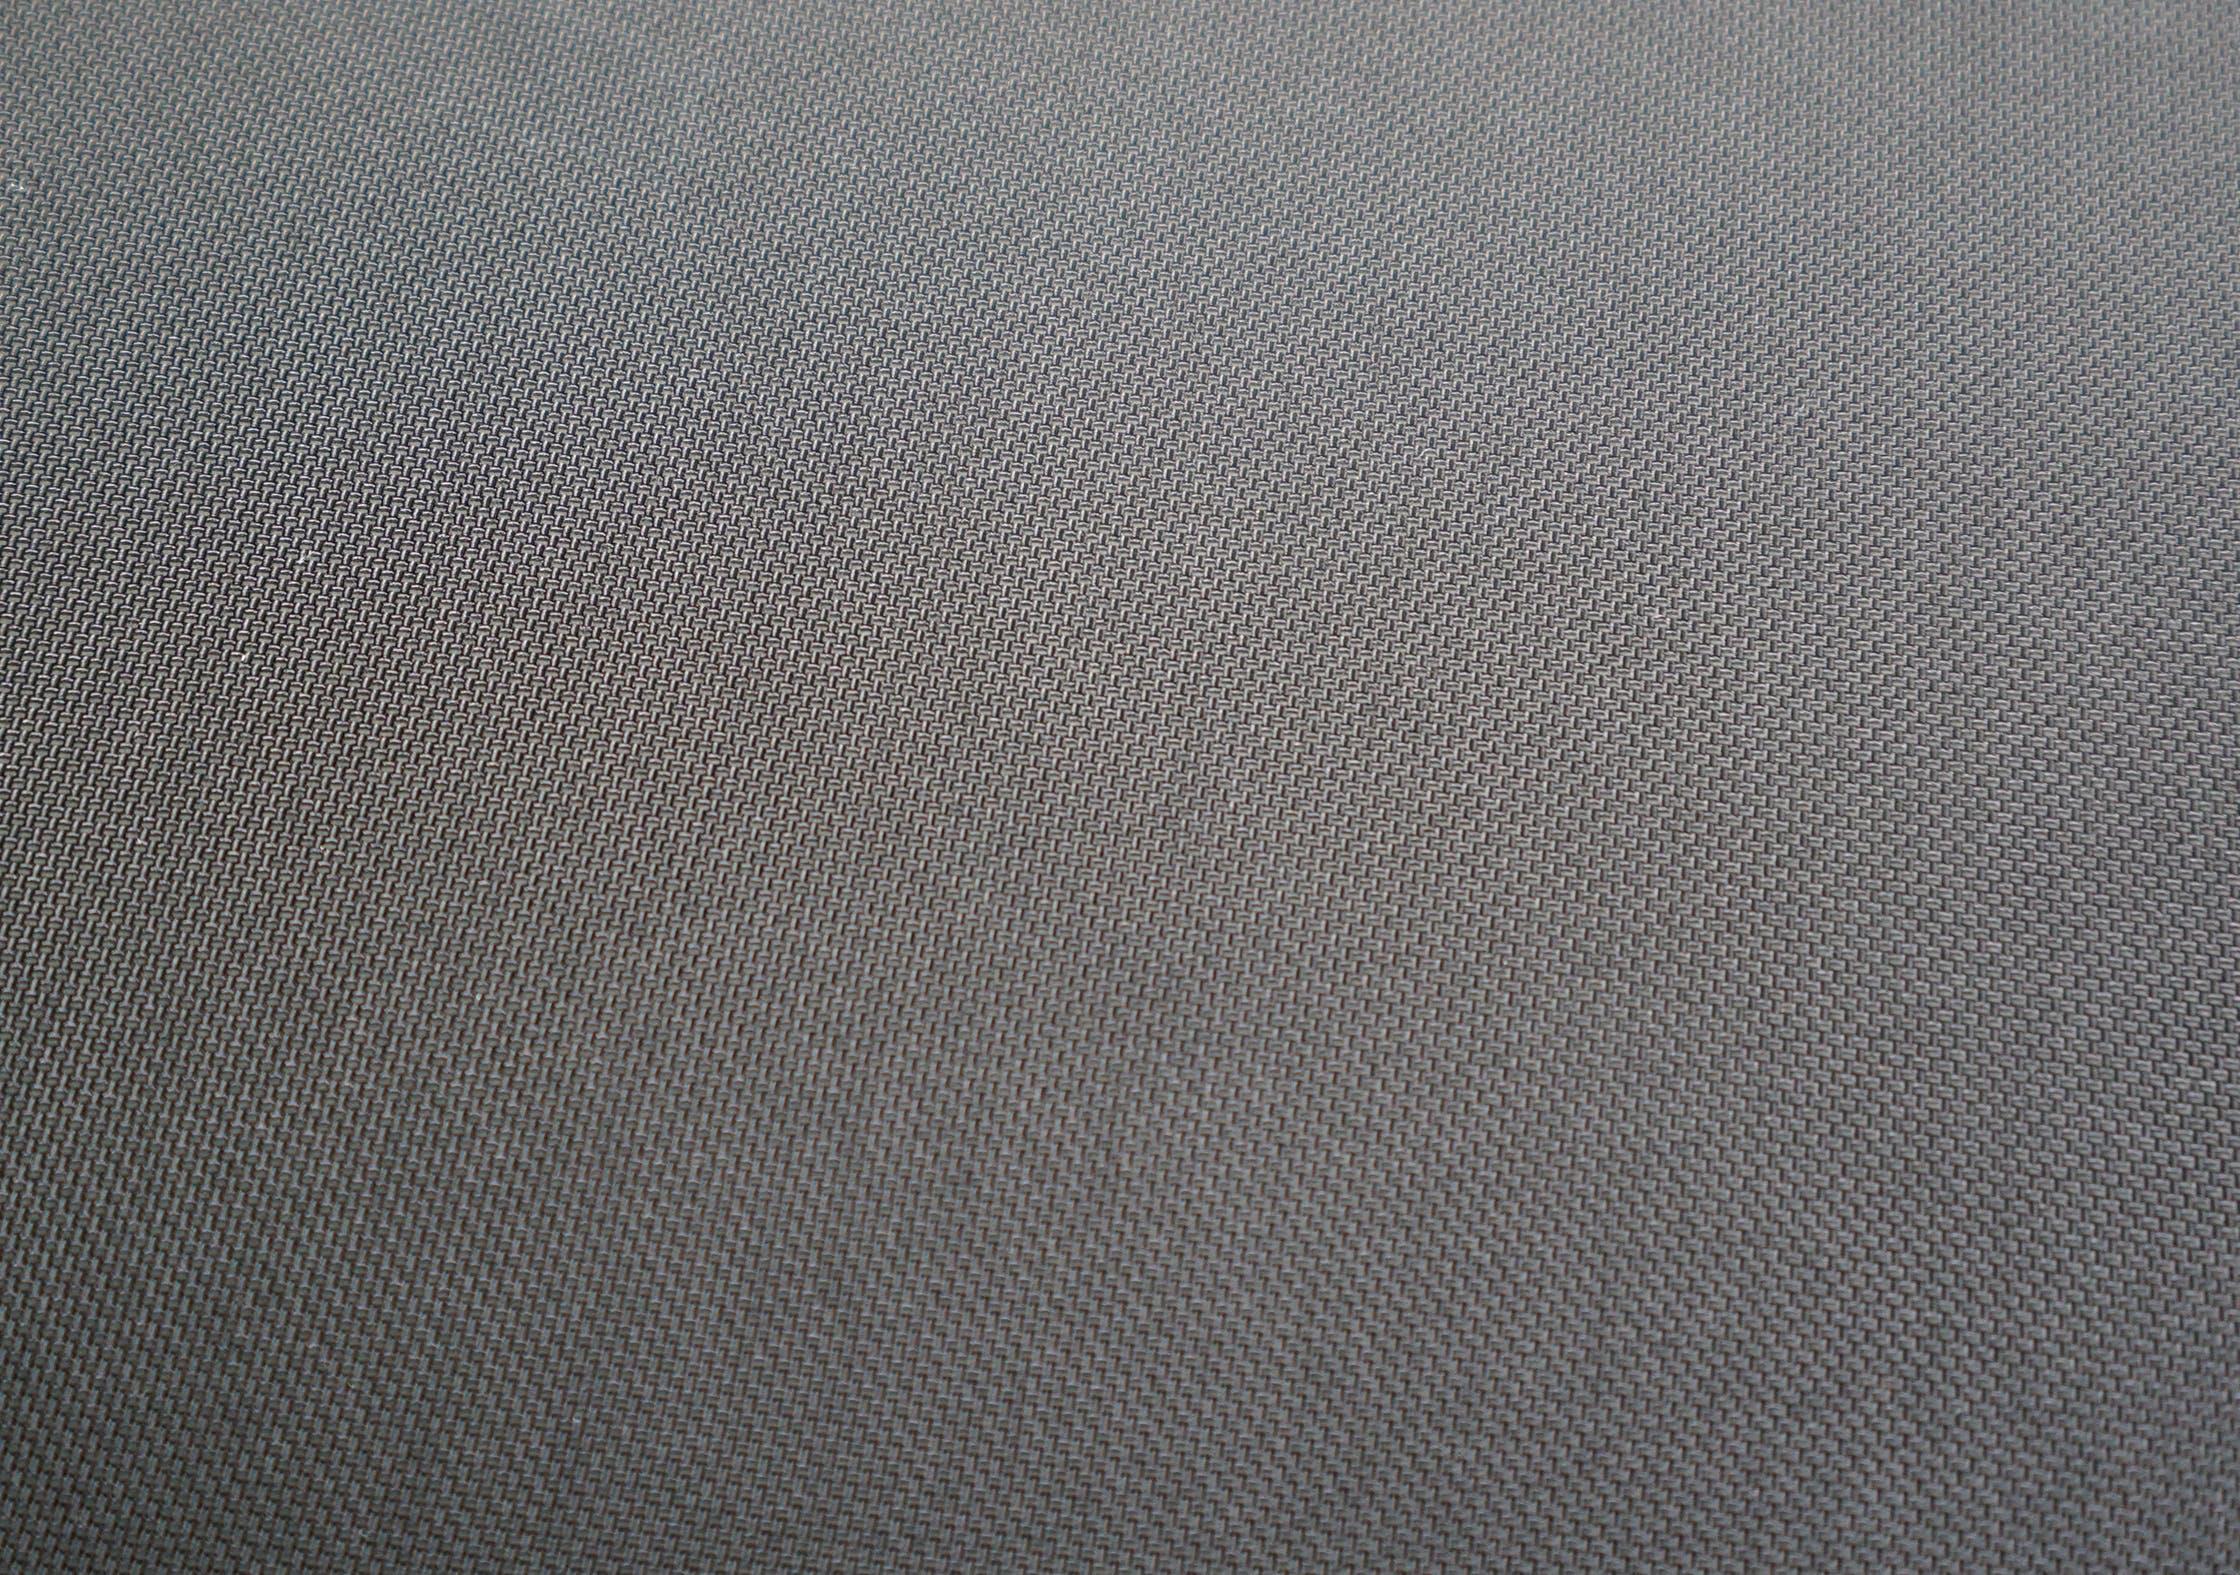 Arc'teryx Blade 28 Backpack Fabric